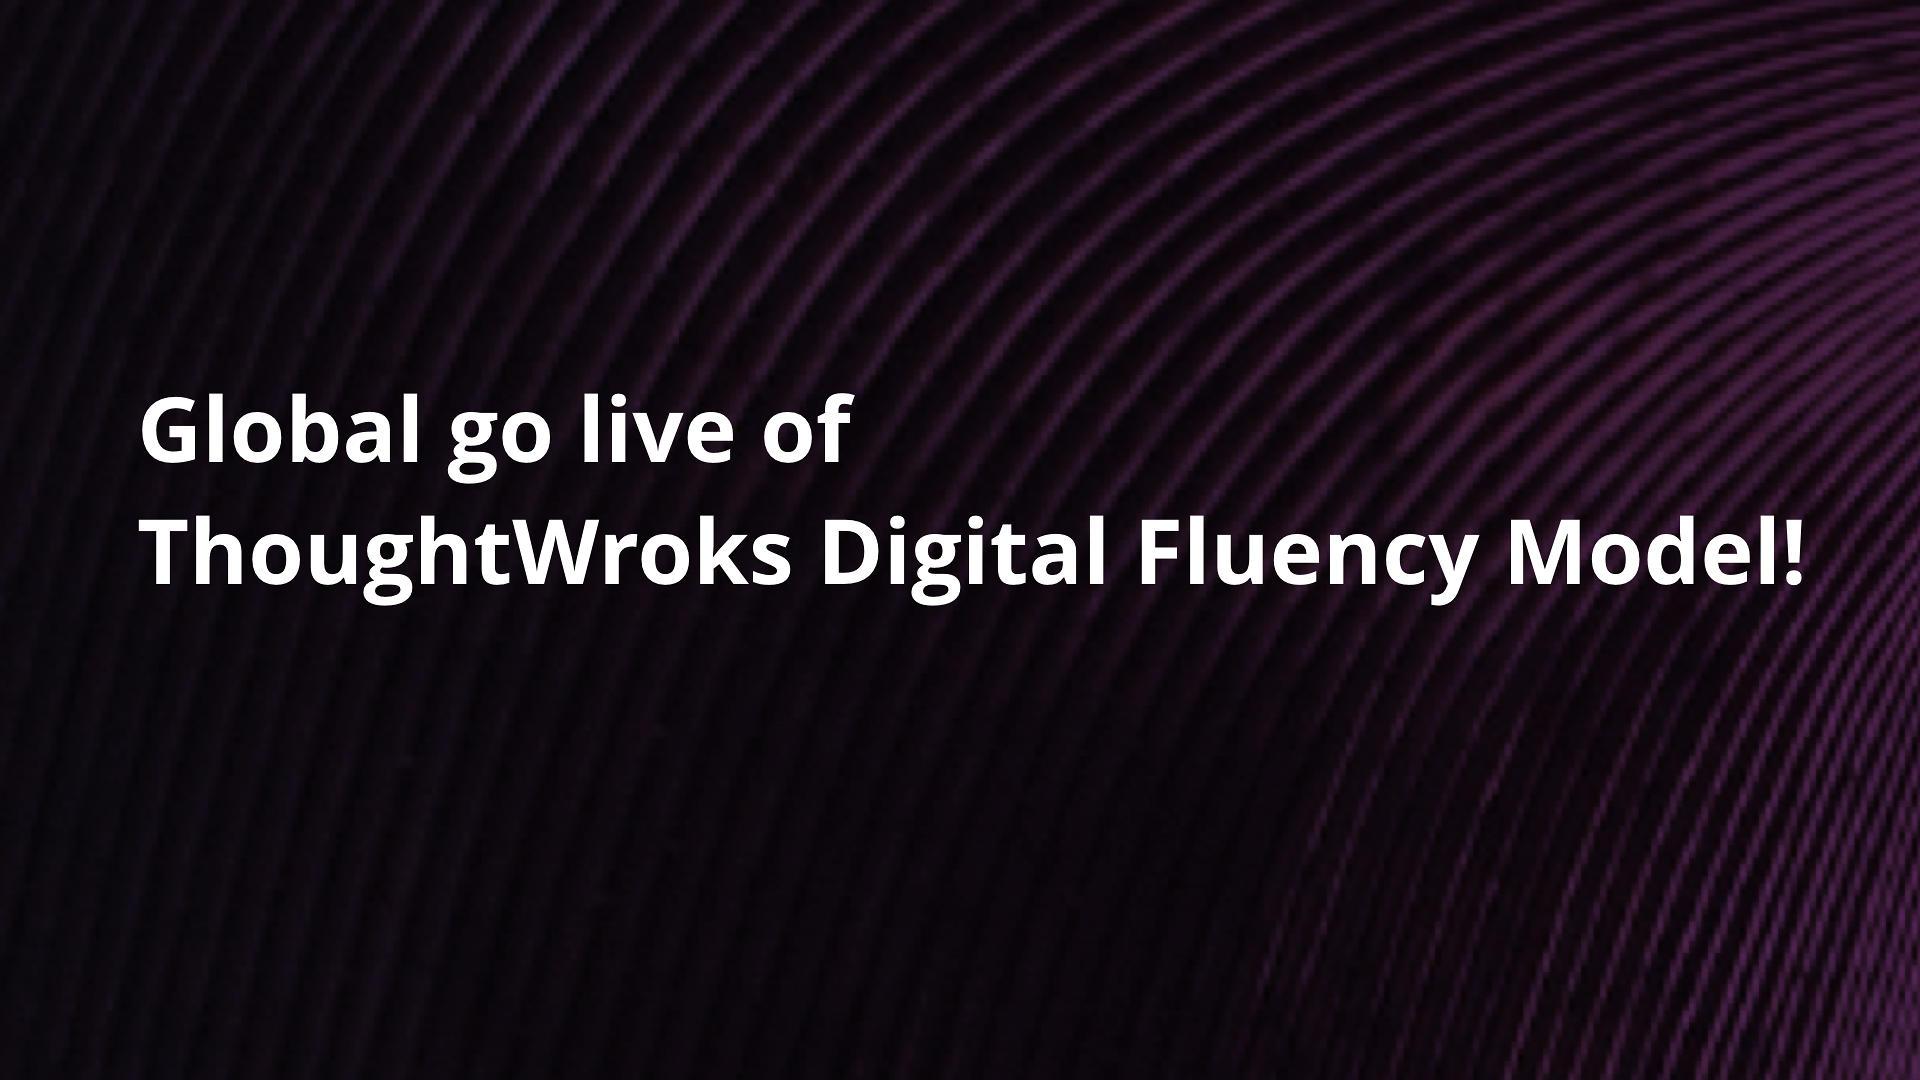 ThoughtWroks Digital Fluency Model